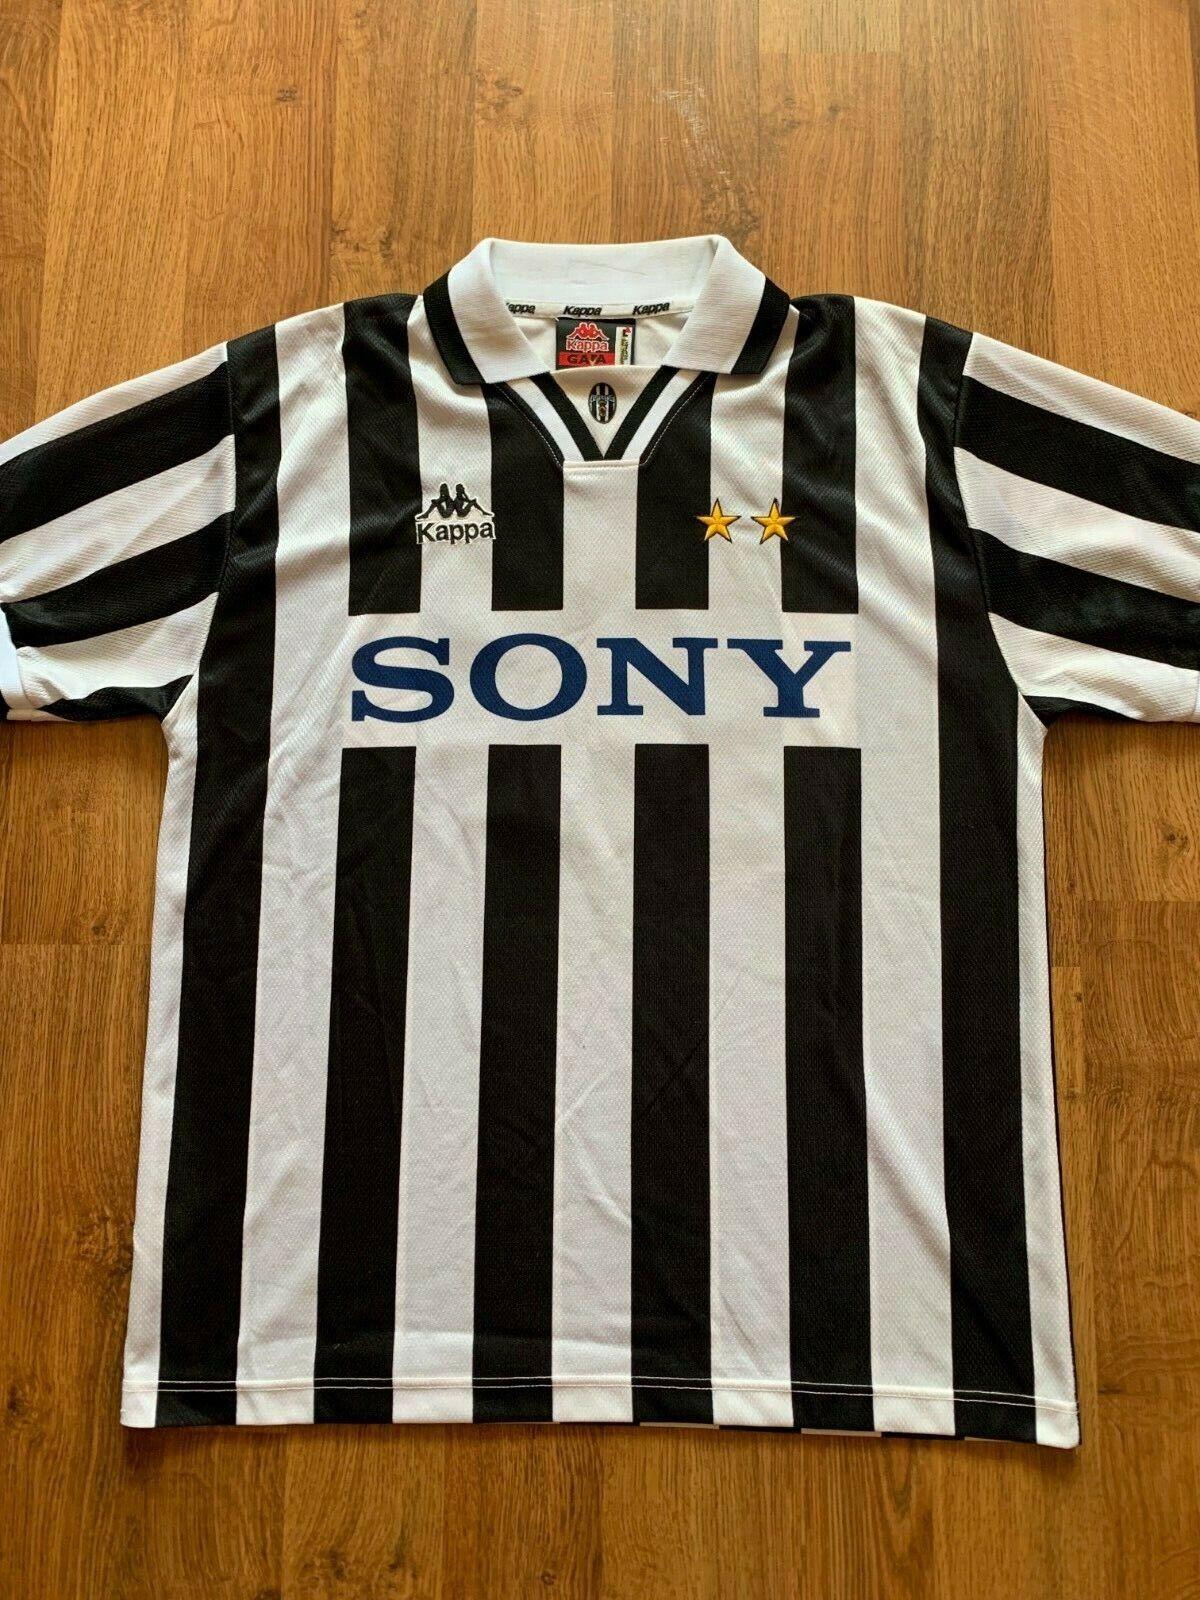 JUVENTUS  10 Del Piero 9697 Home Football Shirt L Soccer Jersey Kappa